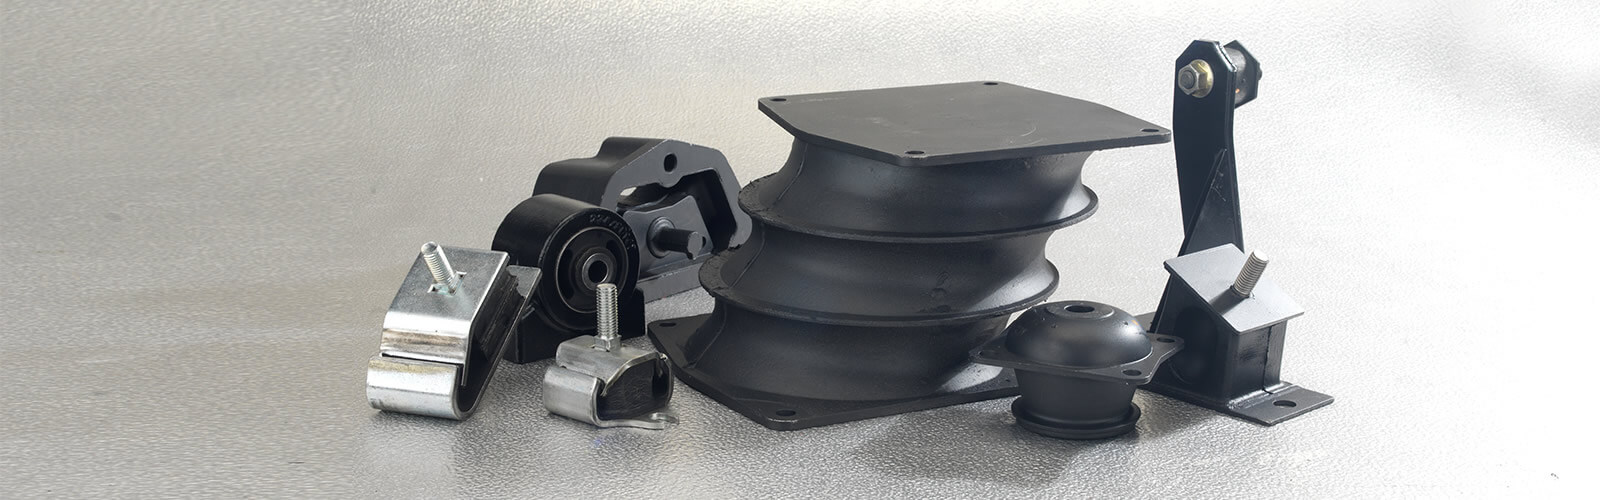 Anti Vibration Mounts Archives Pendle Polymer